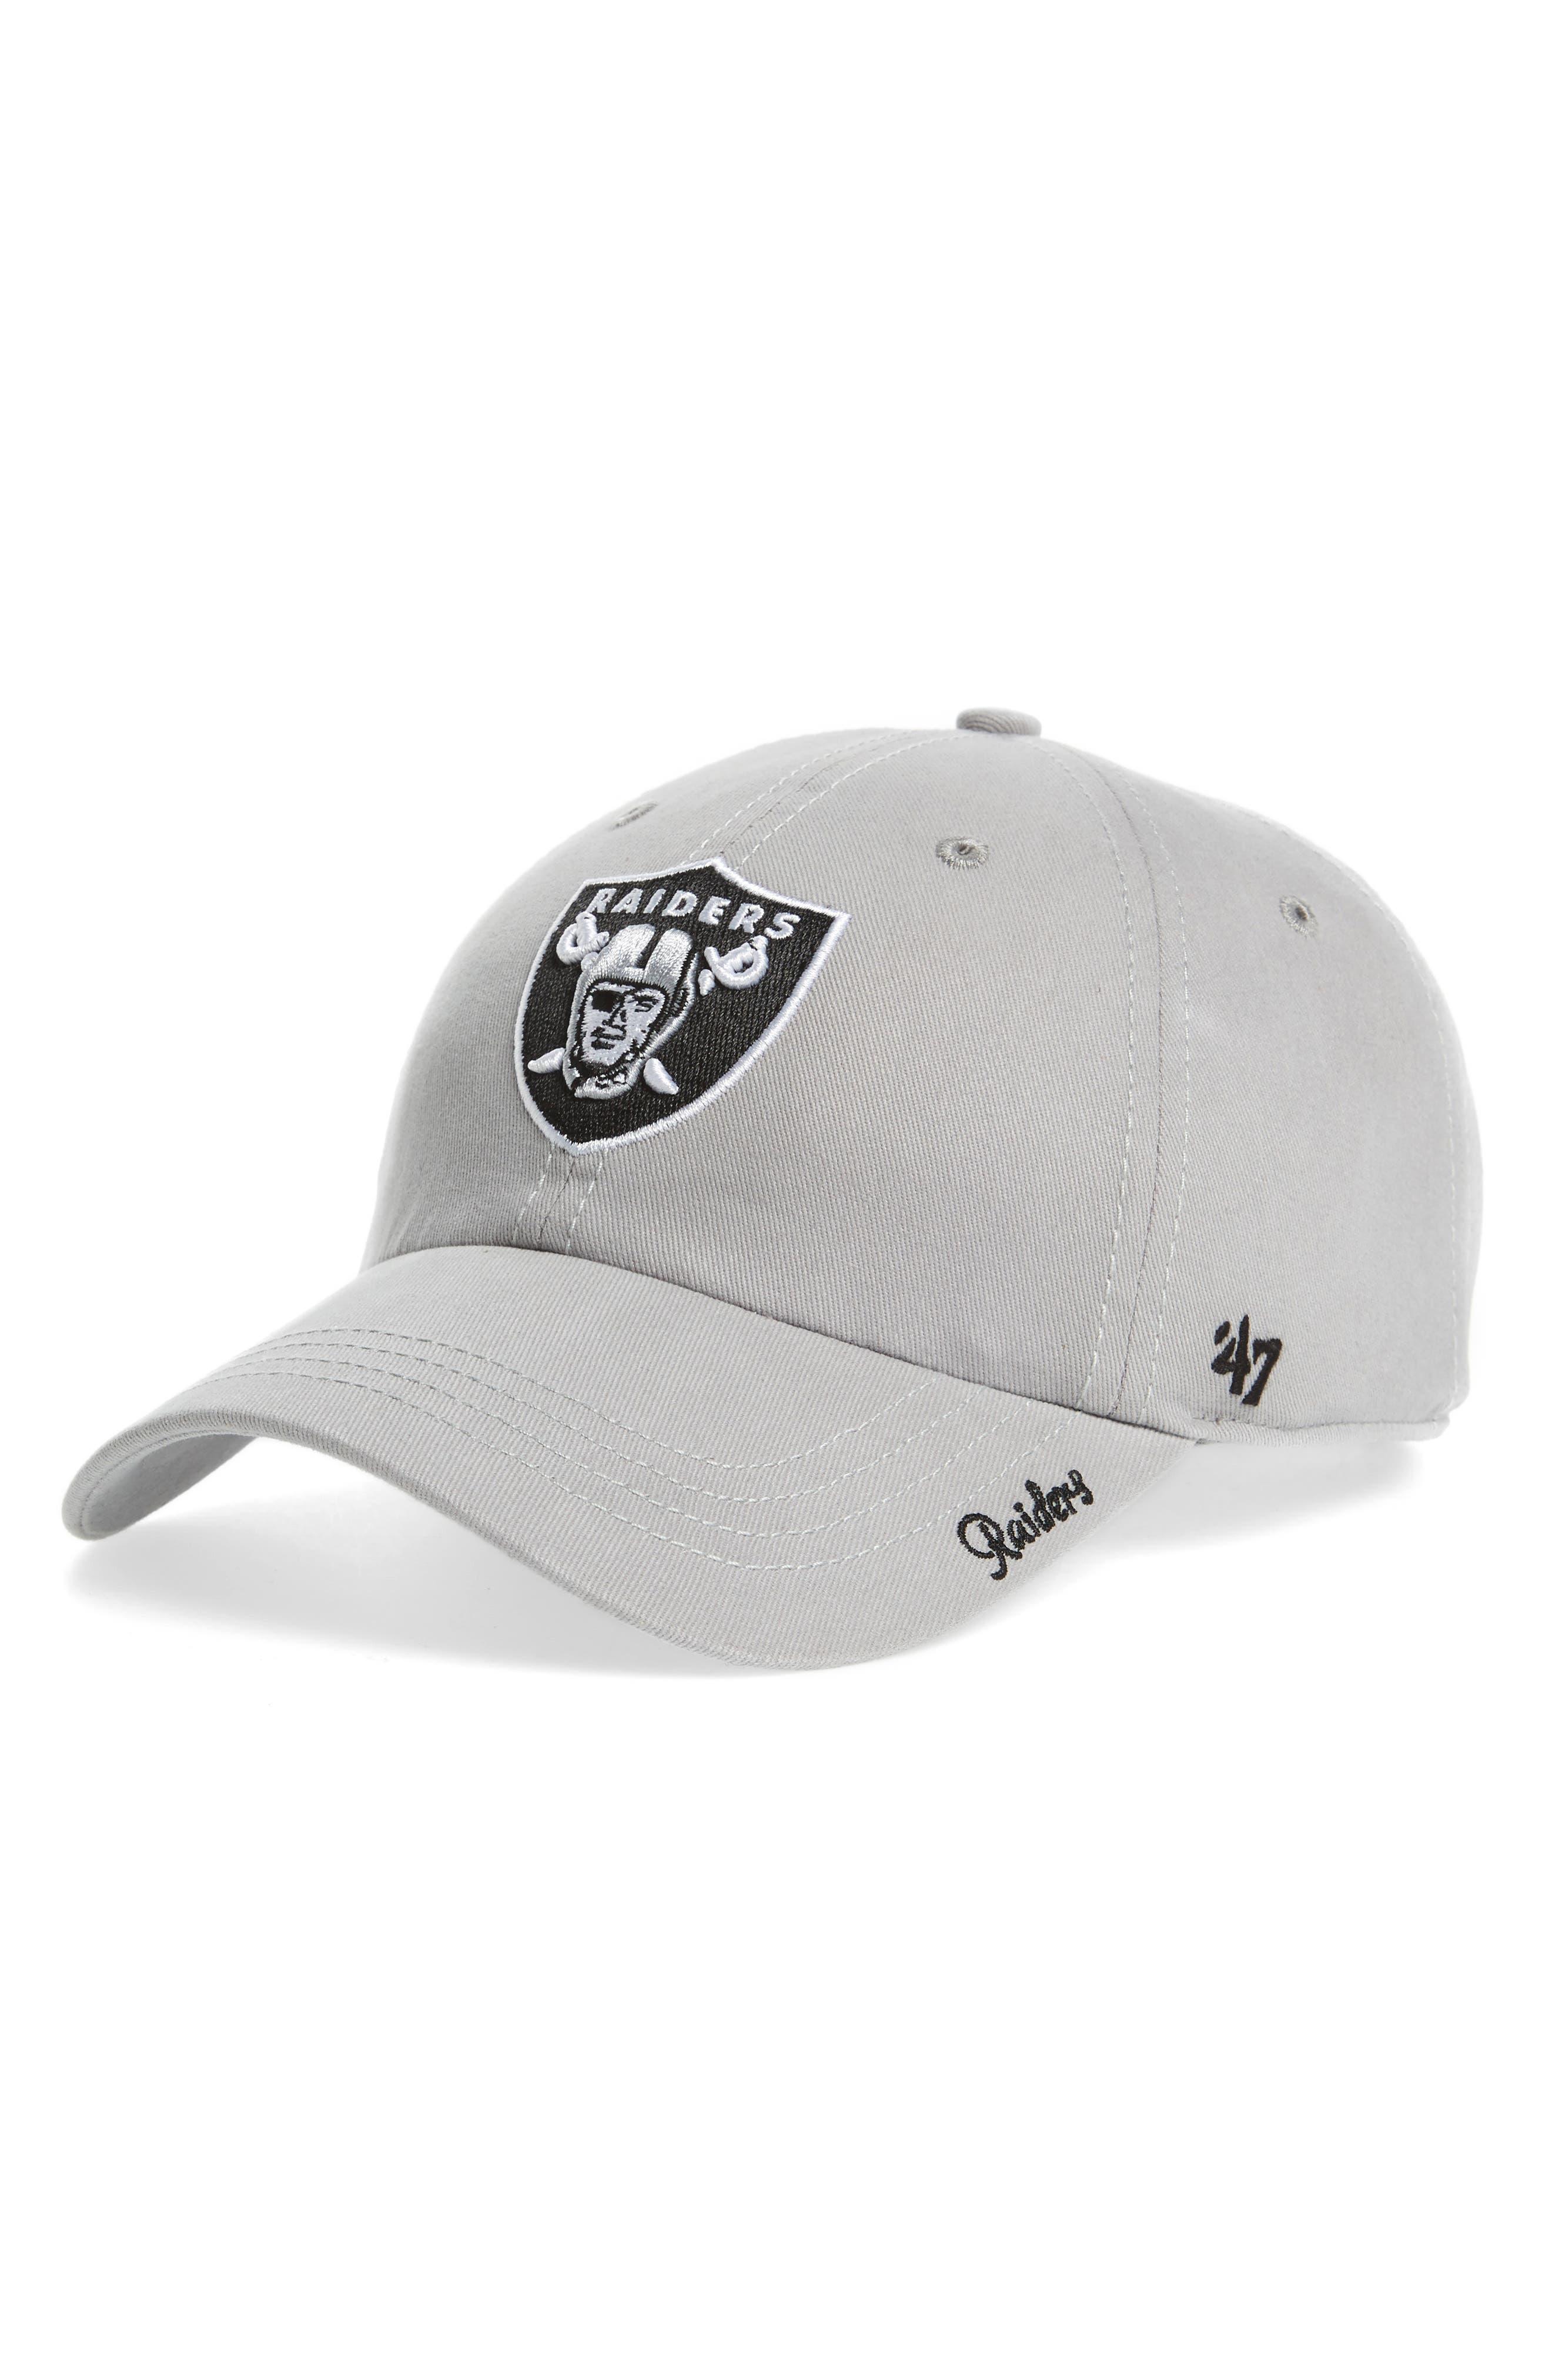 Alternate Image 1 Selected - '47 Miata Oakland Raiders Baseball Cap